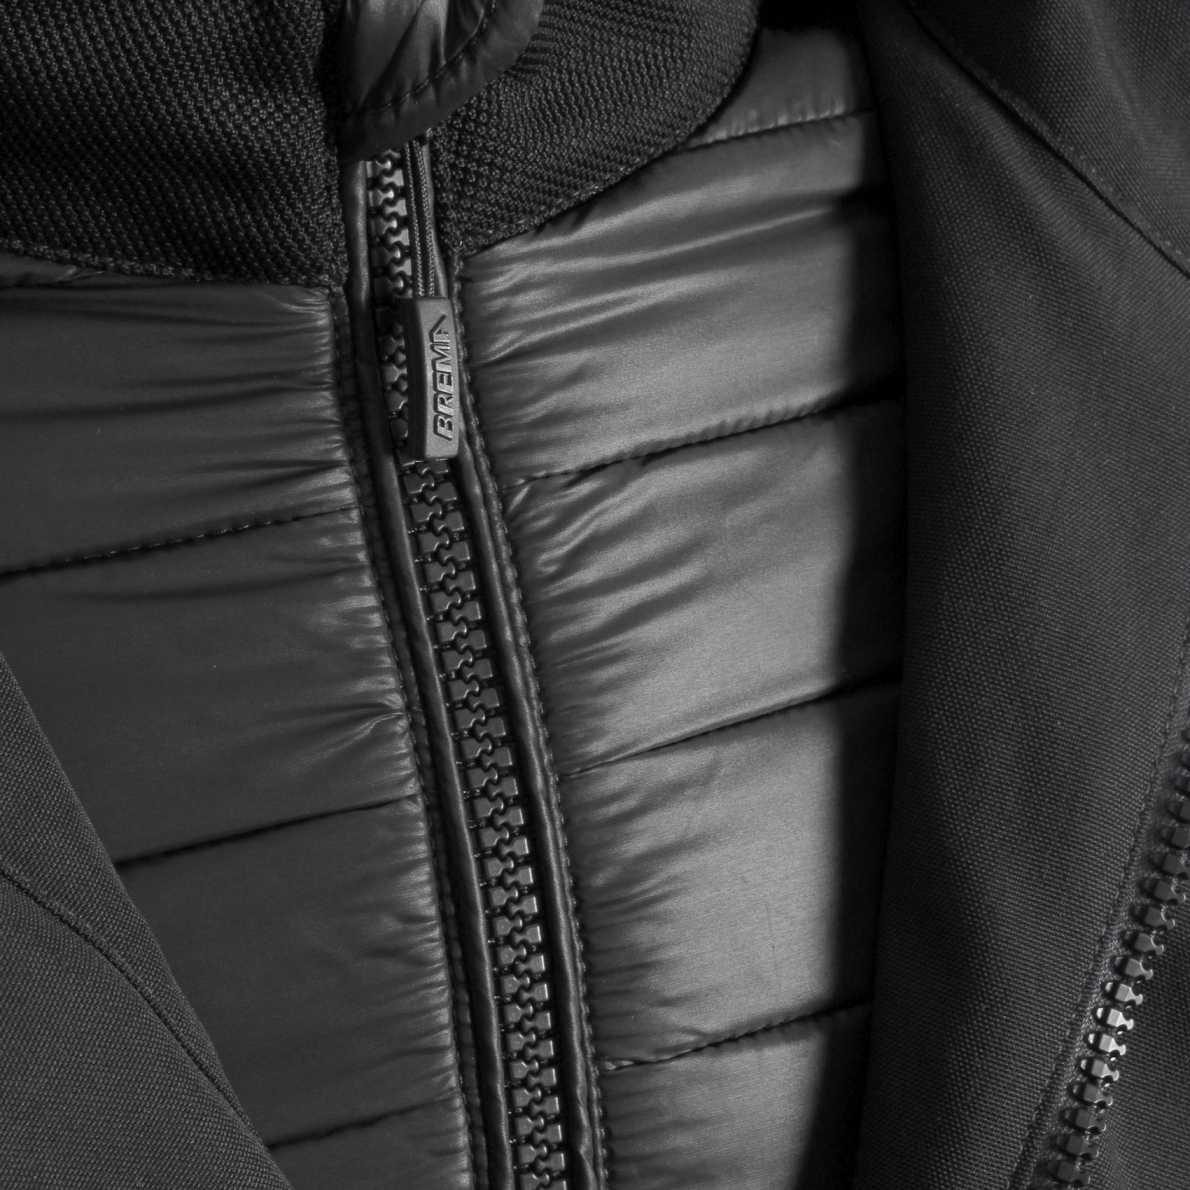 Veste BREMA SILVER VASE GT JKT. Crédits : ©accessoires-moto-enduro-cross.fr 2016